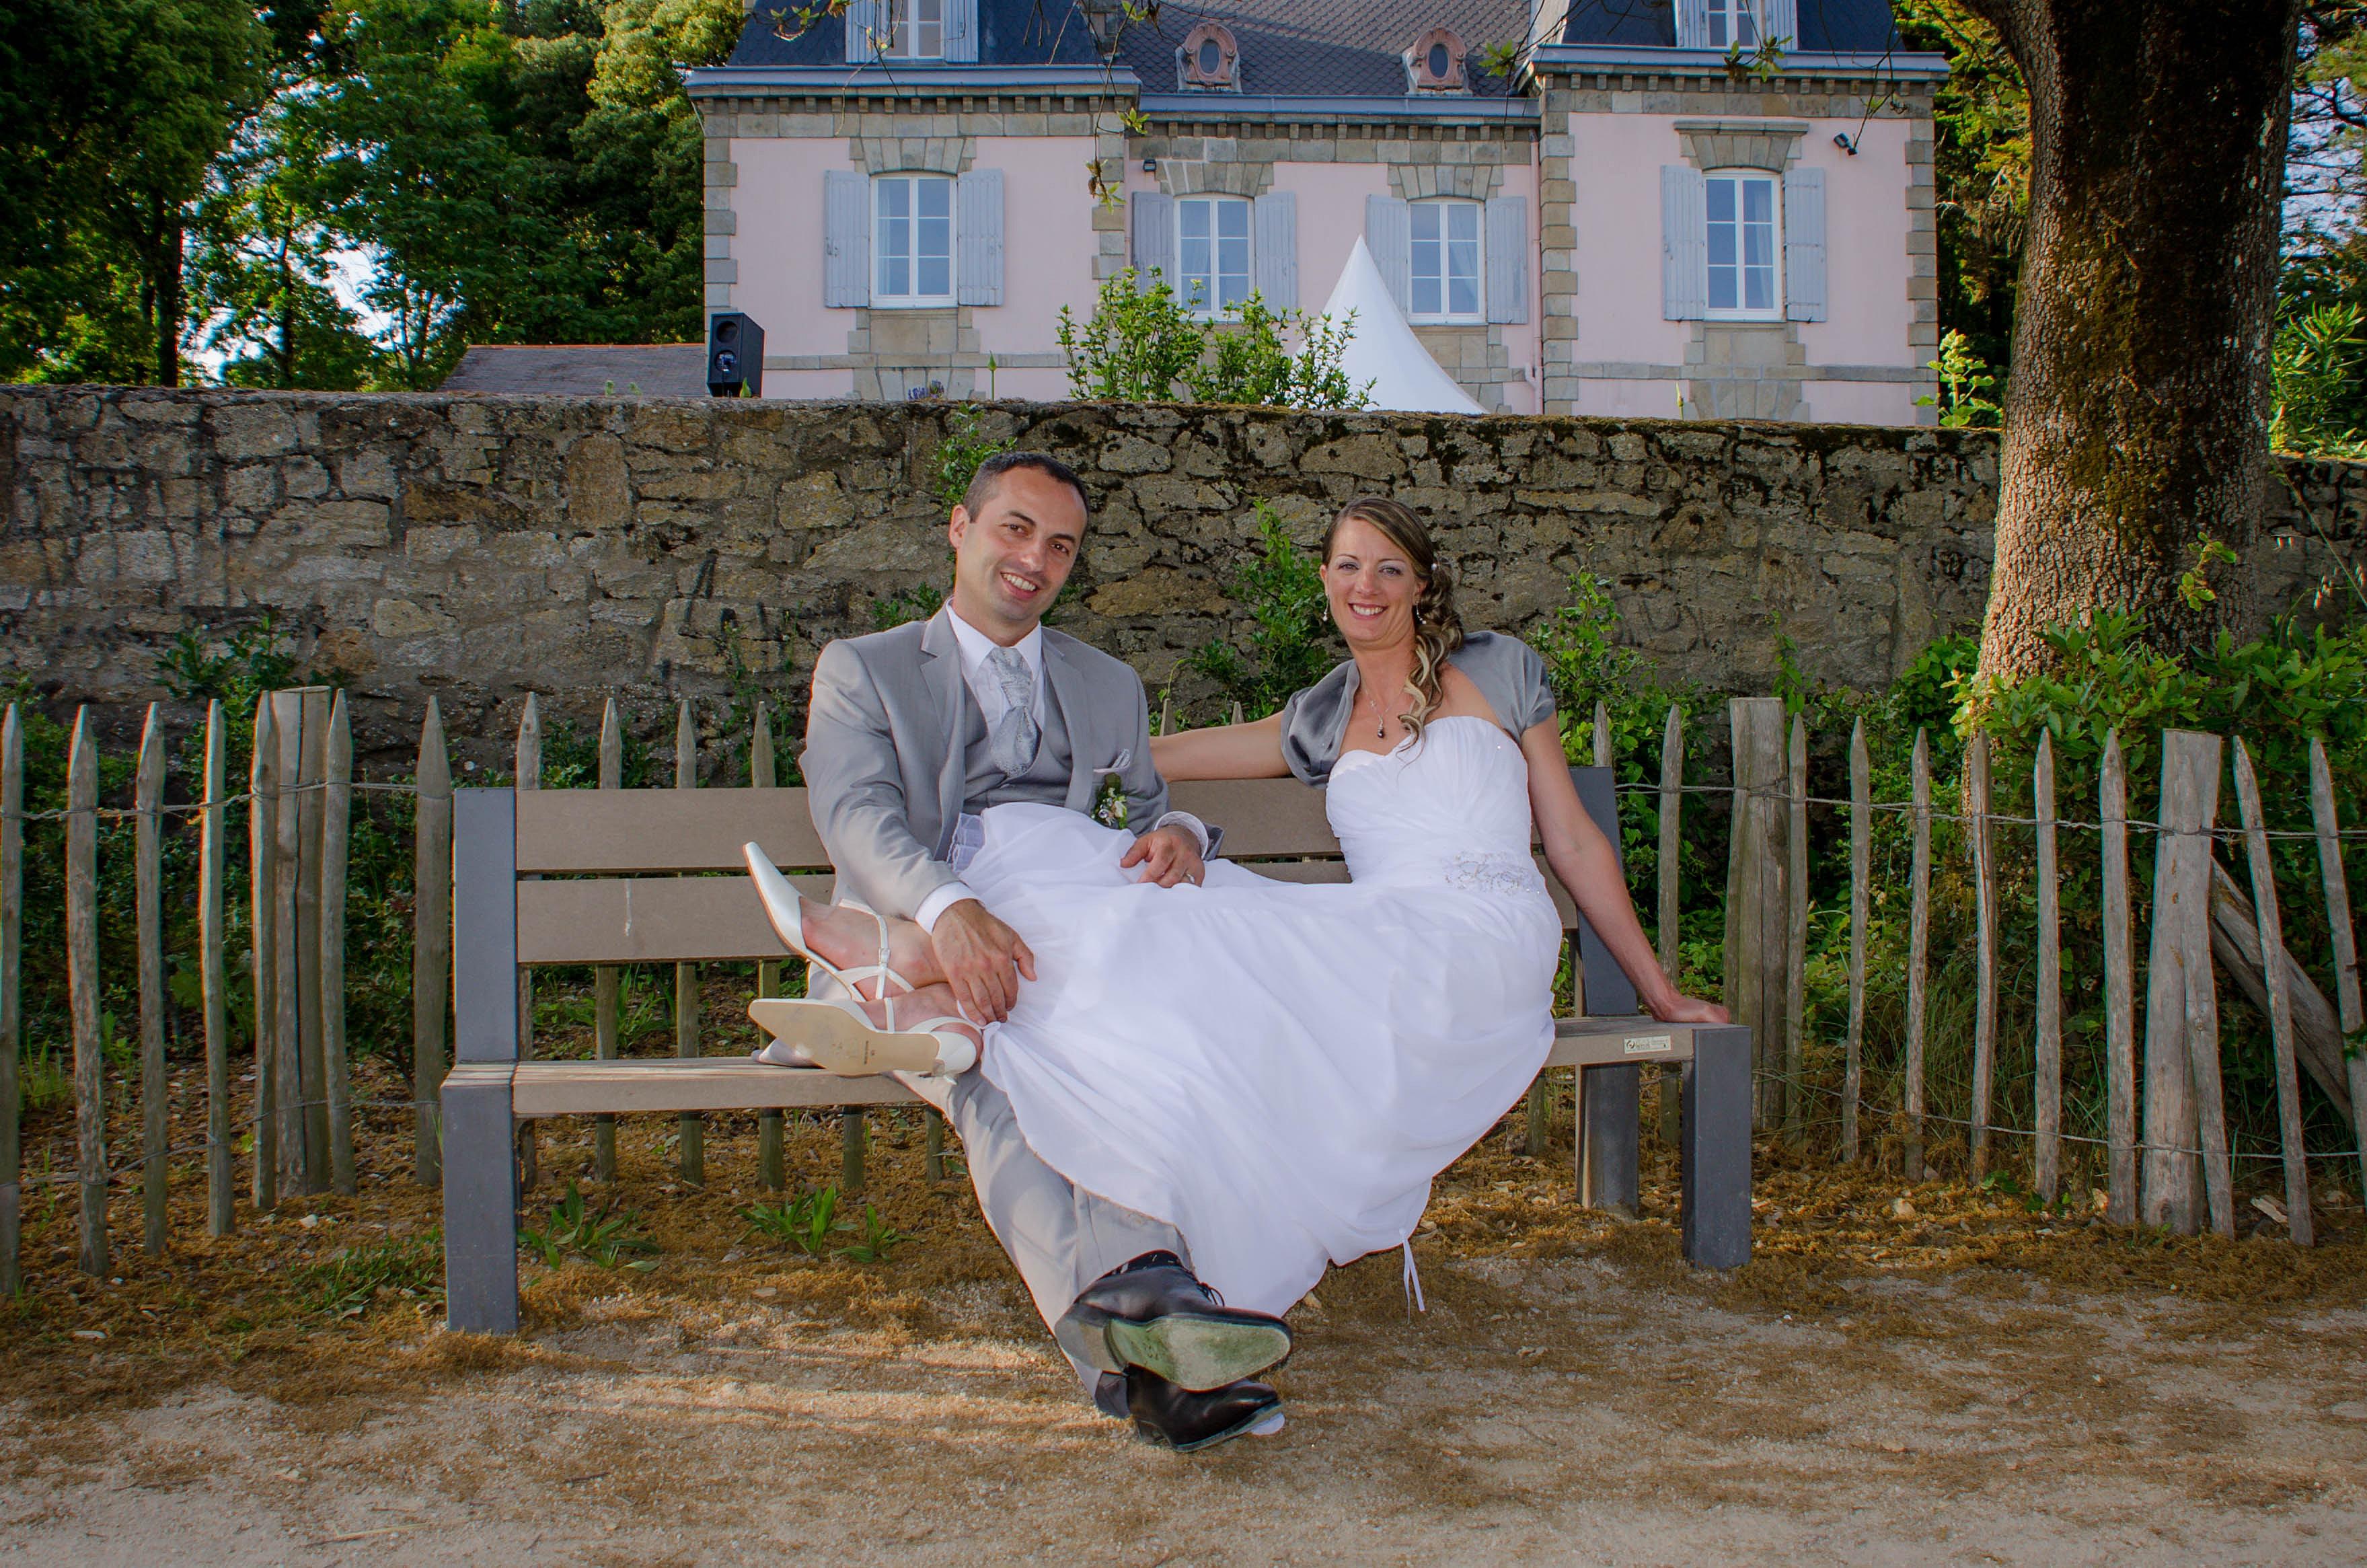 photographe mariage vannes 56 - Photographe Mariage Vannes